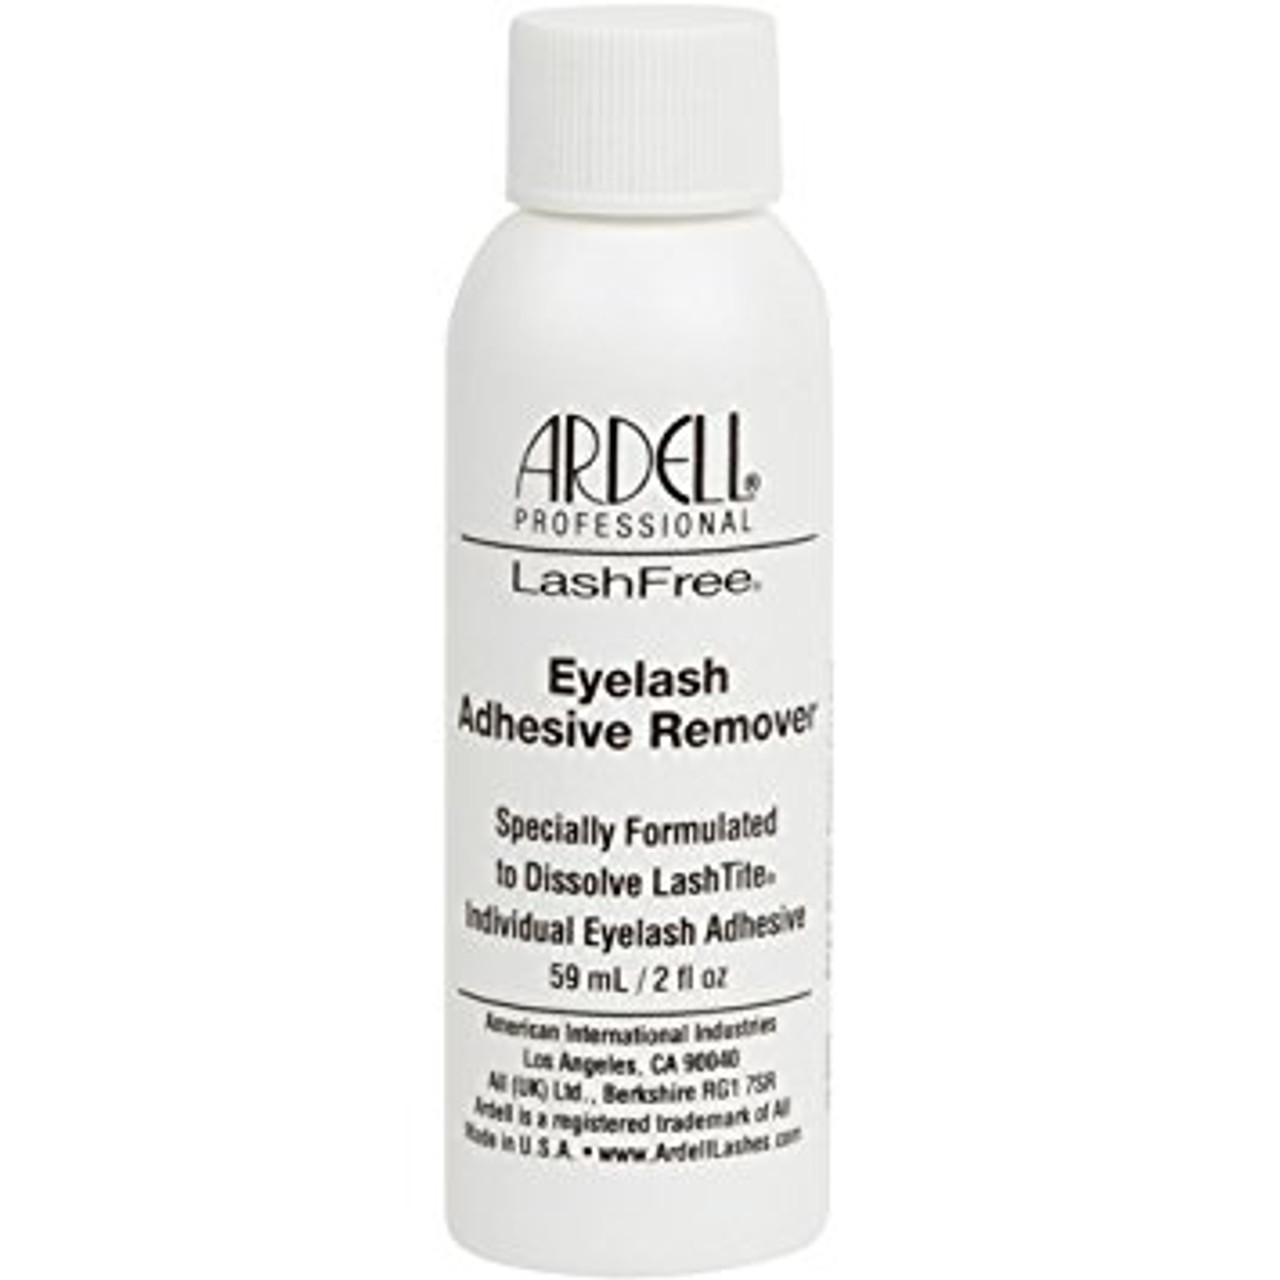 Ardell Lashfree Adhesive Remover 2 oz